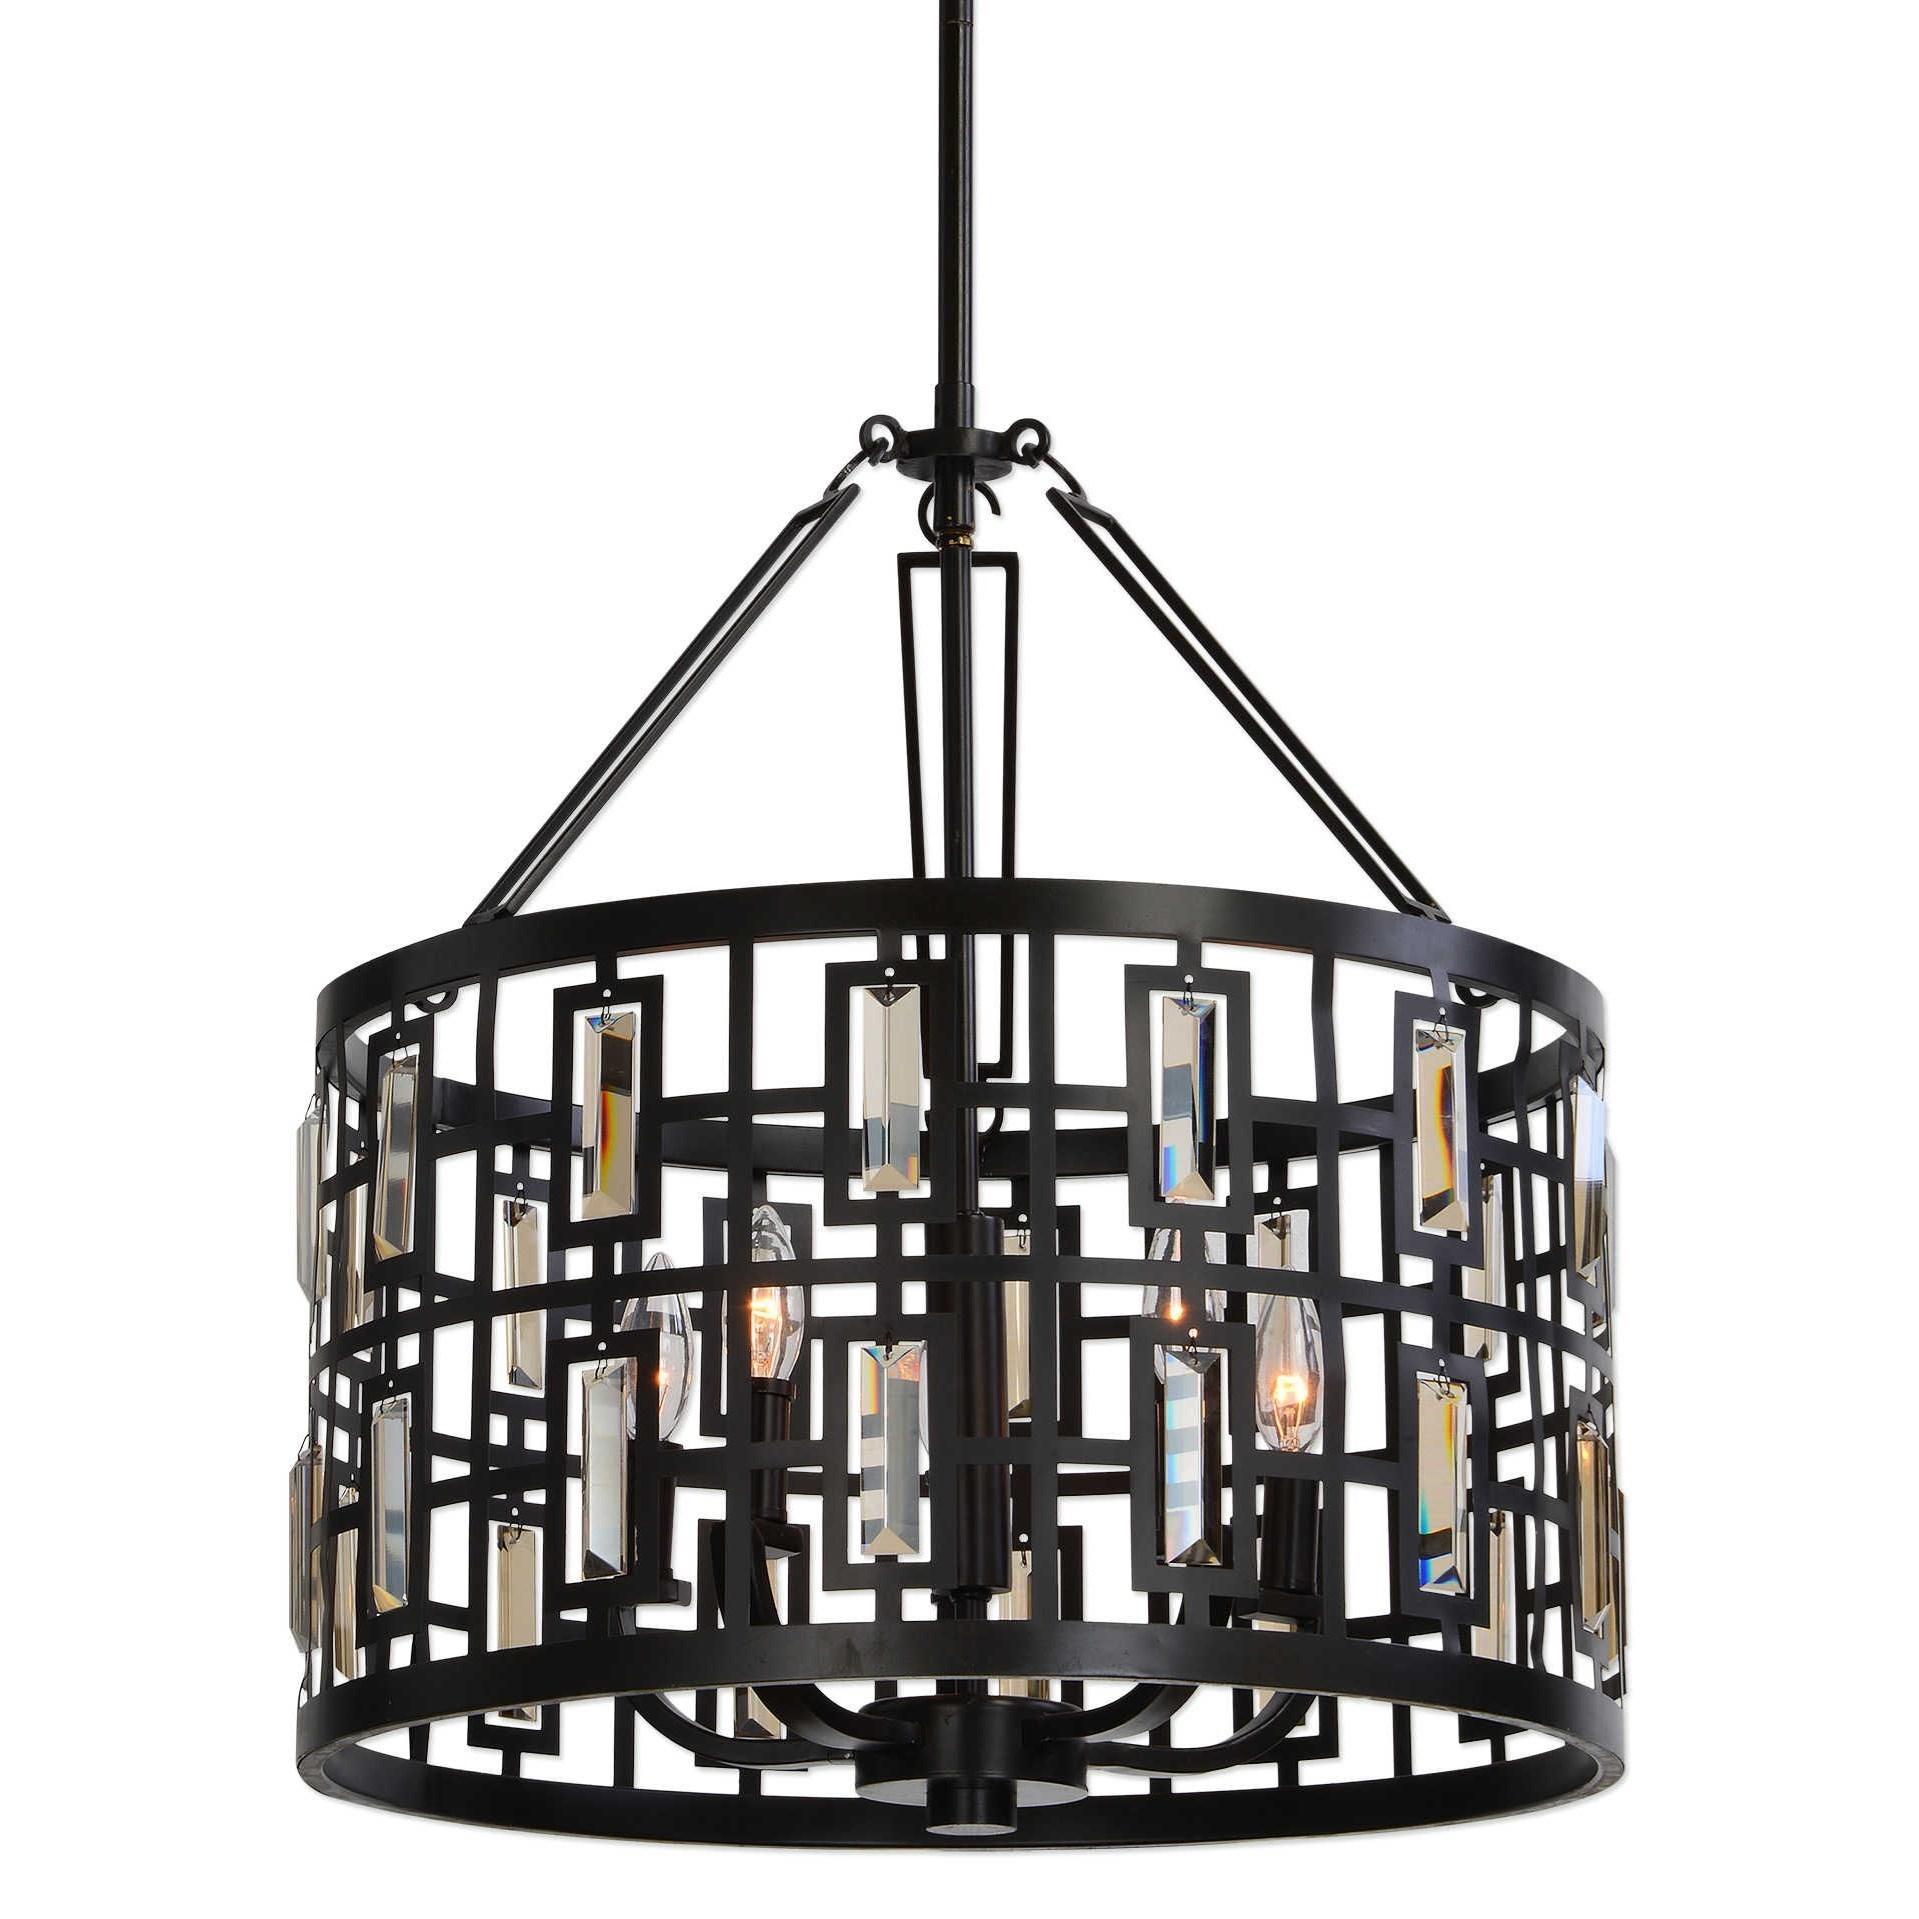 Uttermost lighting fixtures 22115 rhombus 5 light bronze pendant del sol furniture pendant - Spectacular modern pendant lighting fixtures as center of attention ...